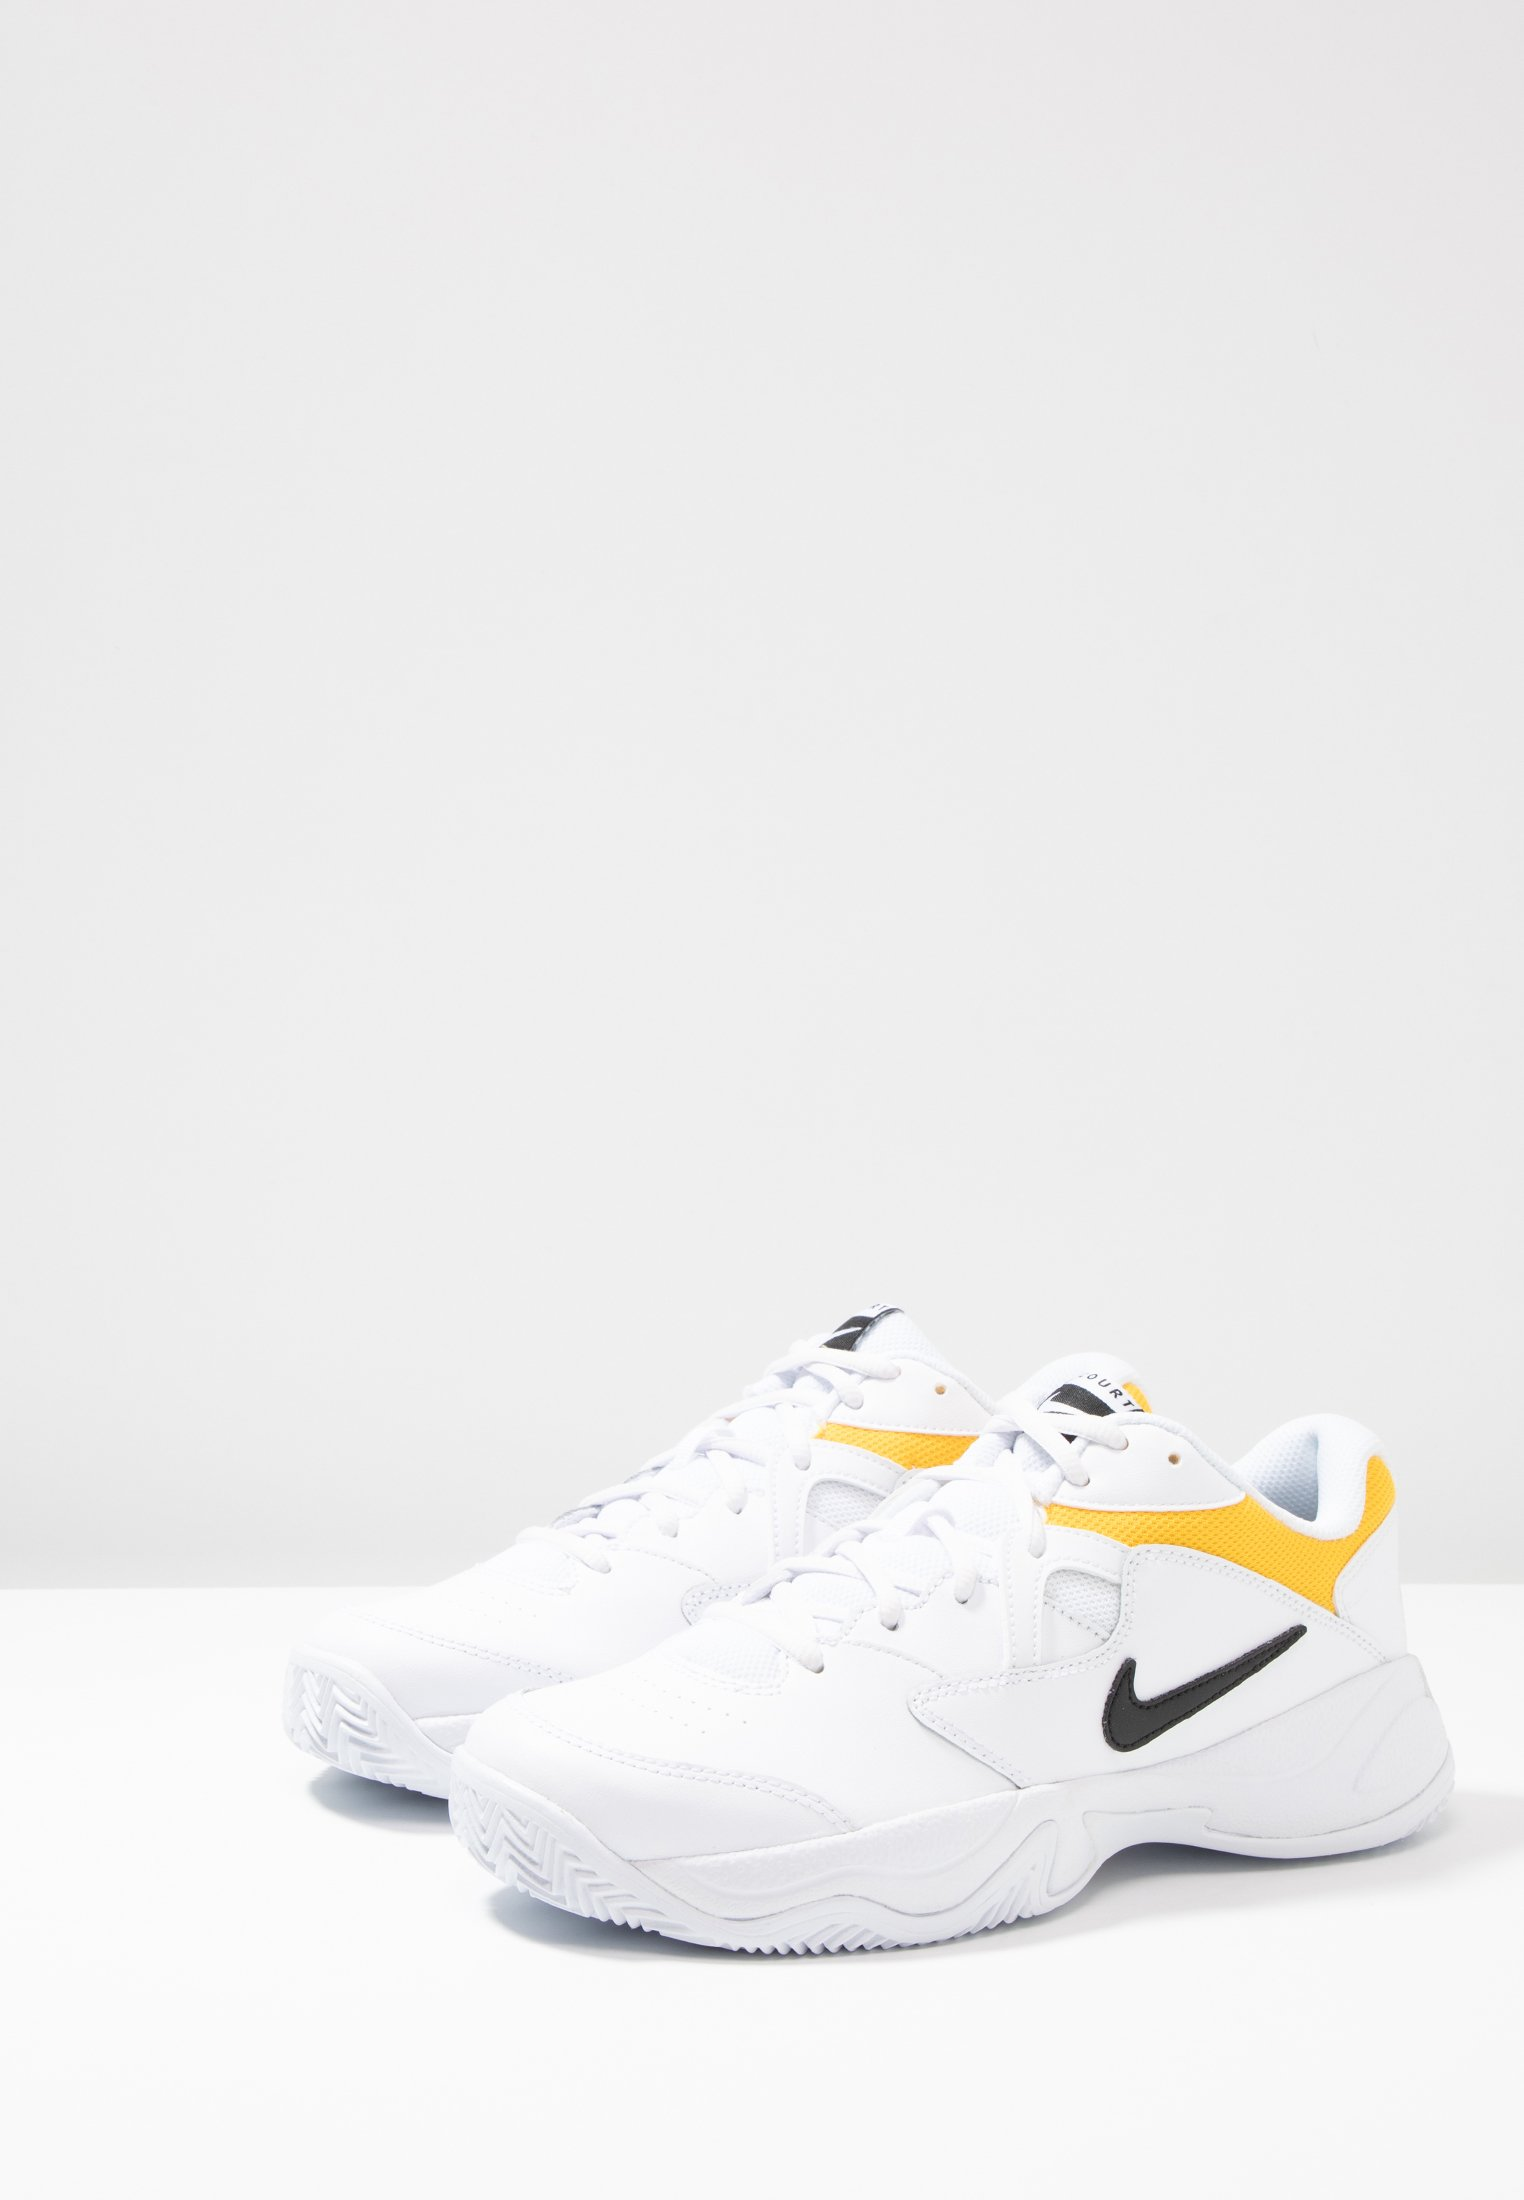 Court Lite Gold White university Pour Terre Performance Battue battueerre Nike black Tennis De ClyChaussures dBotxshQrC